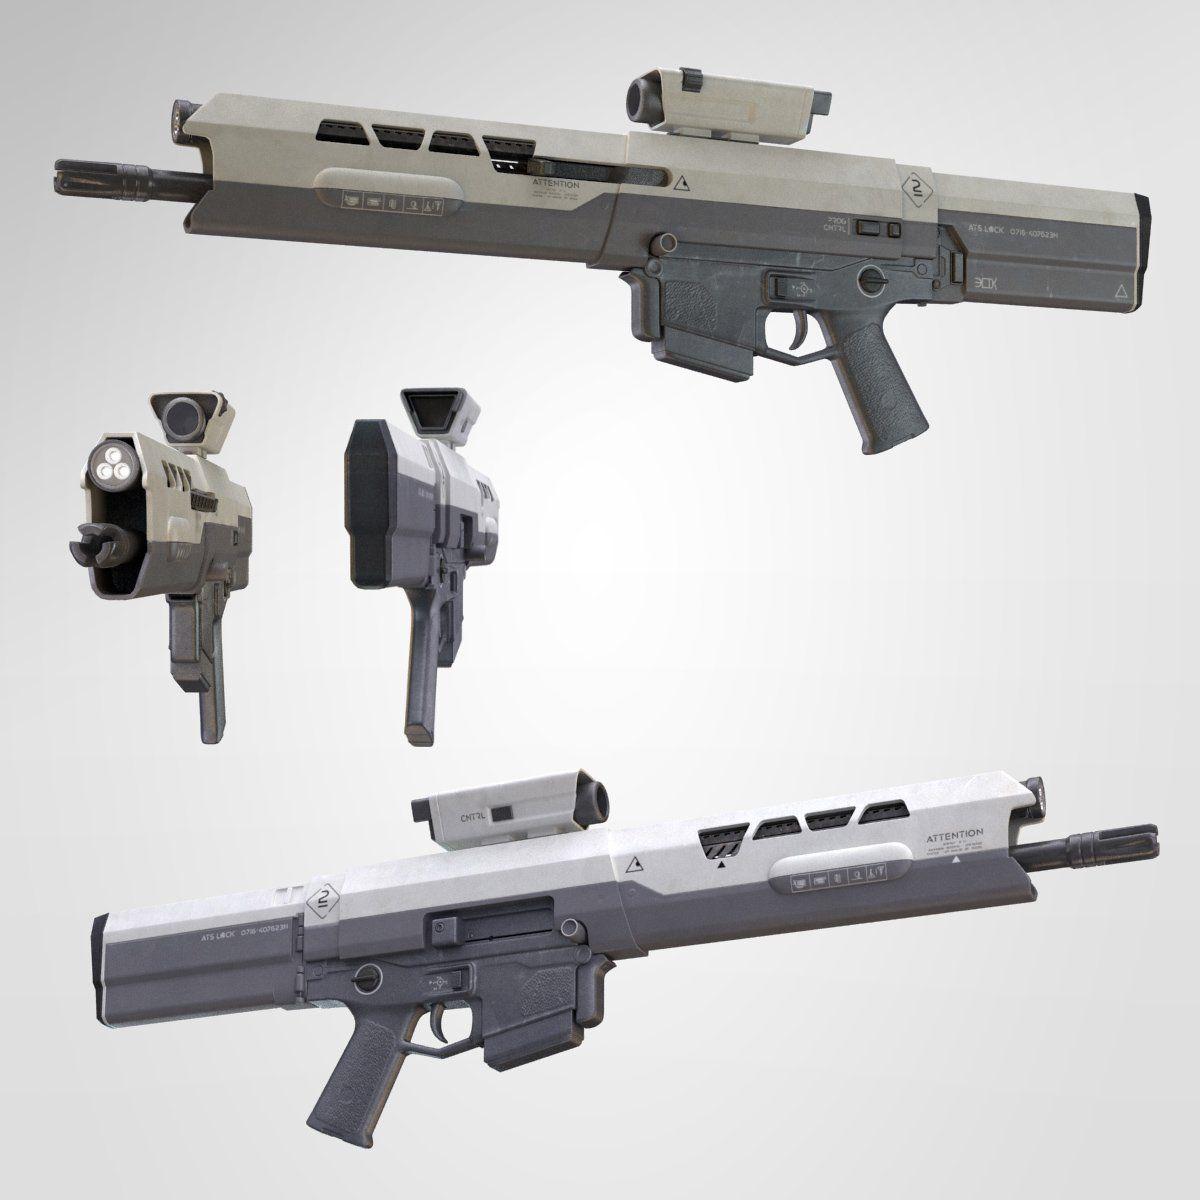 Royalty free Oblivion Rifle 3D Model by korazen  Available